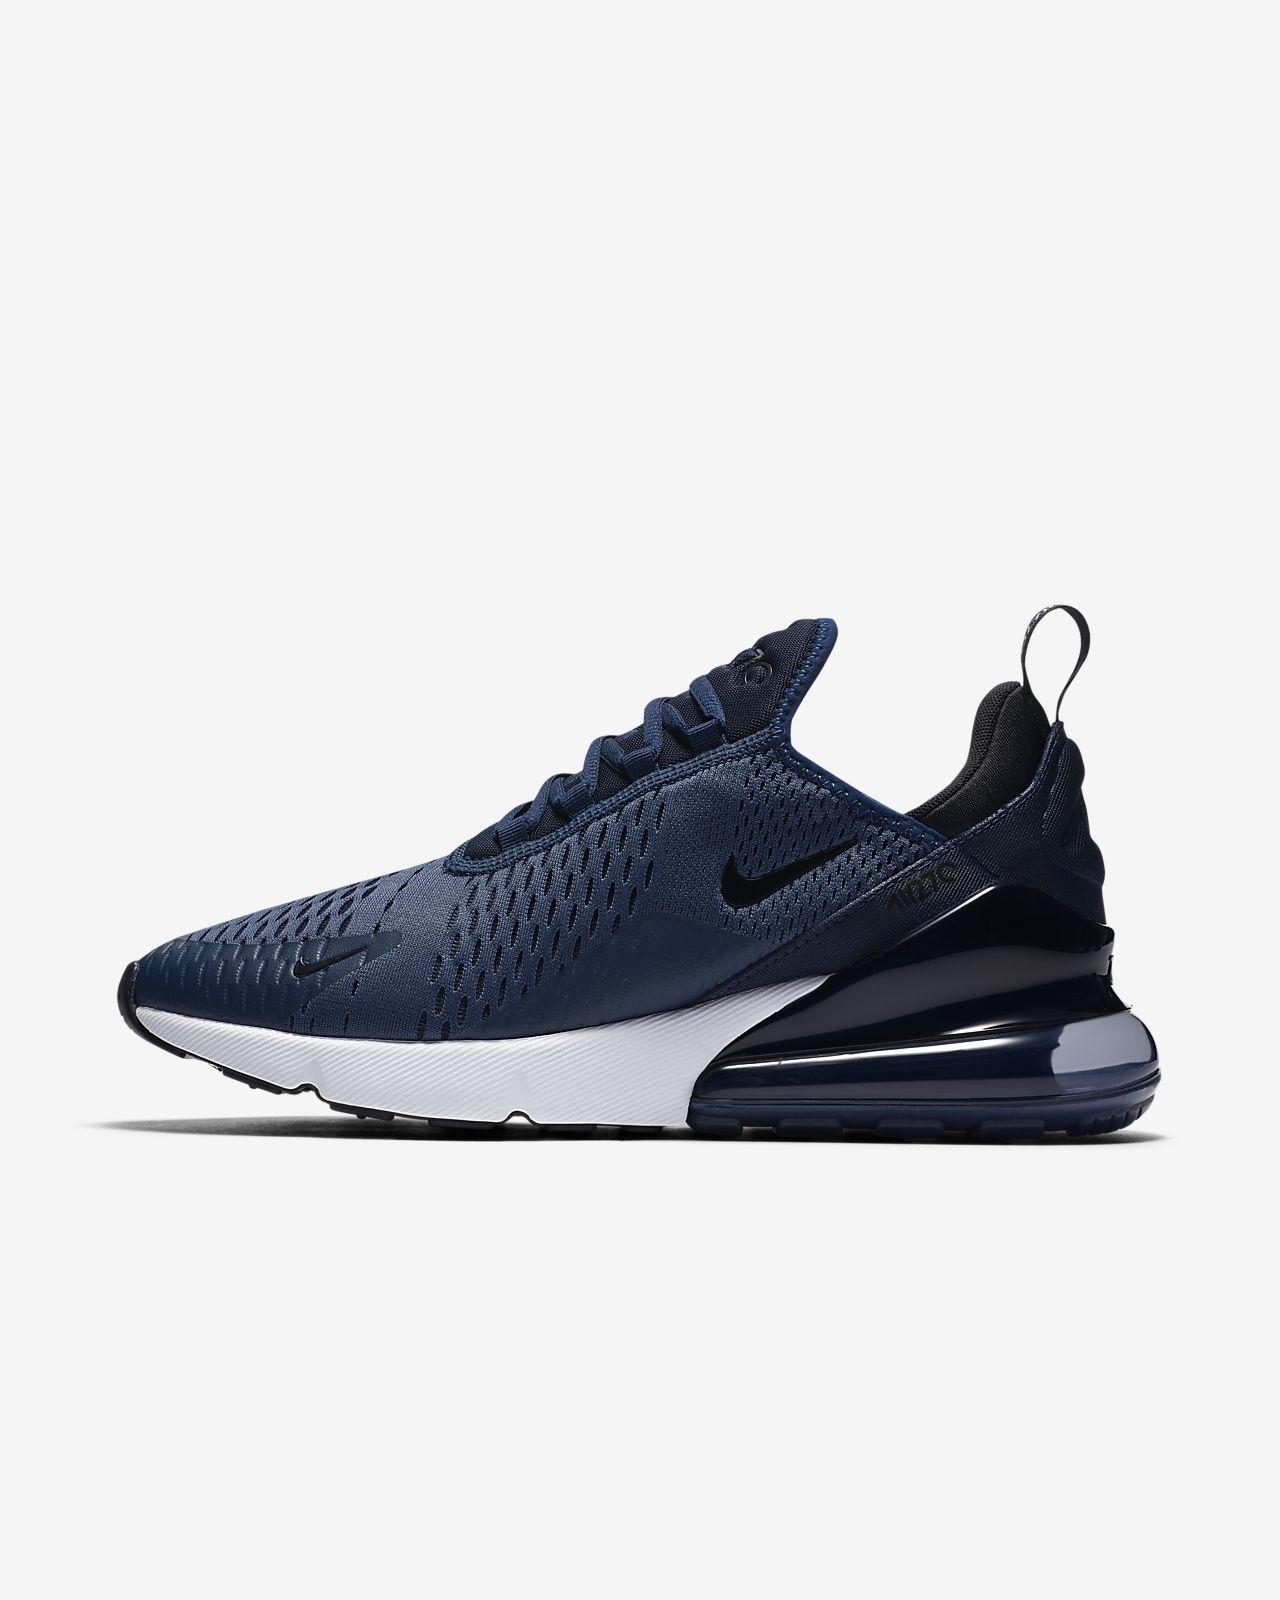 separation shoes 59ec9 e35c3 ... Scarpa Nike Air Max 270 - Uomo